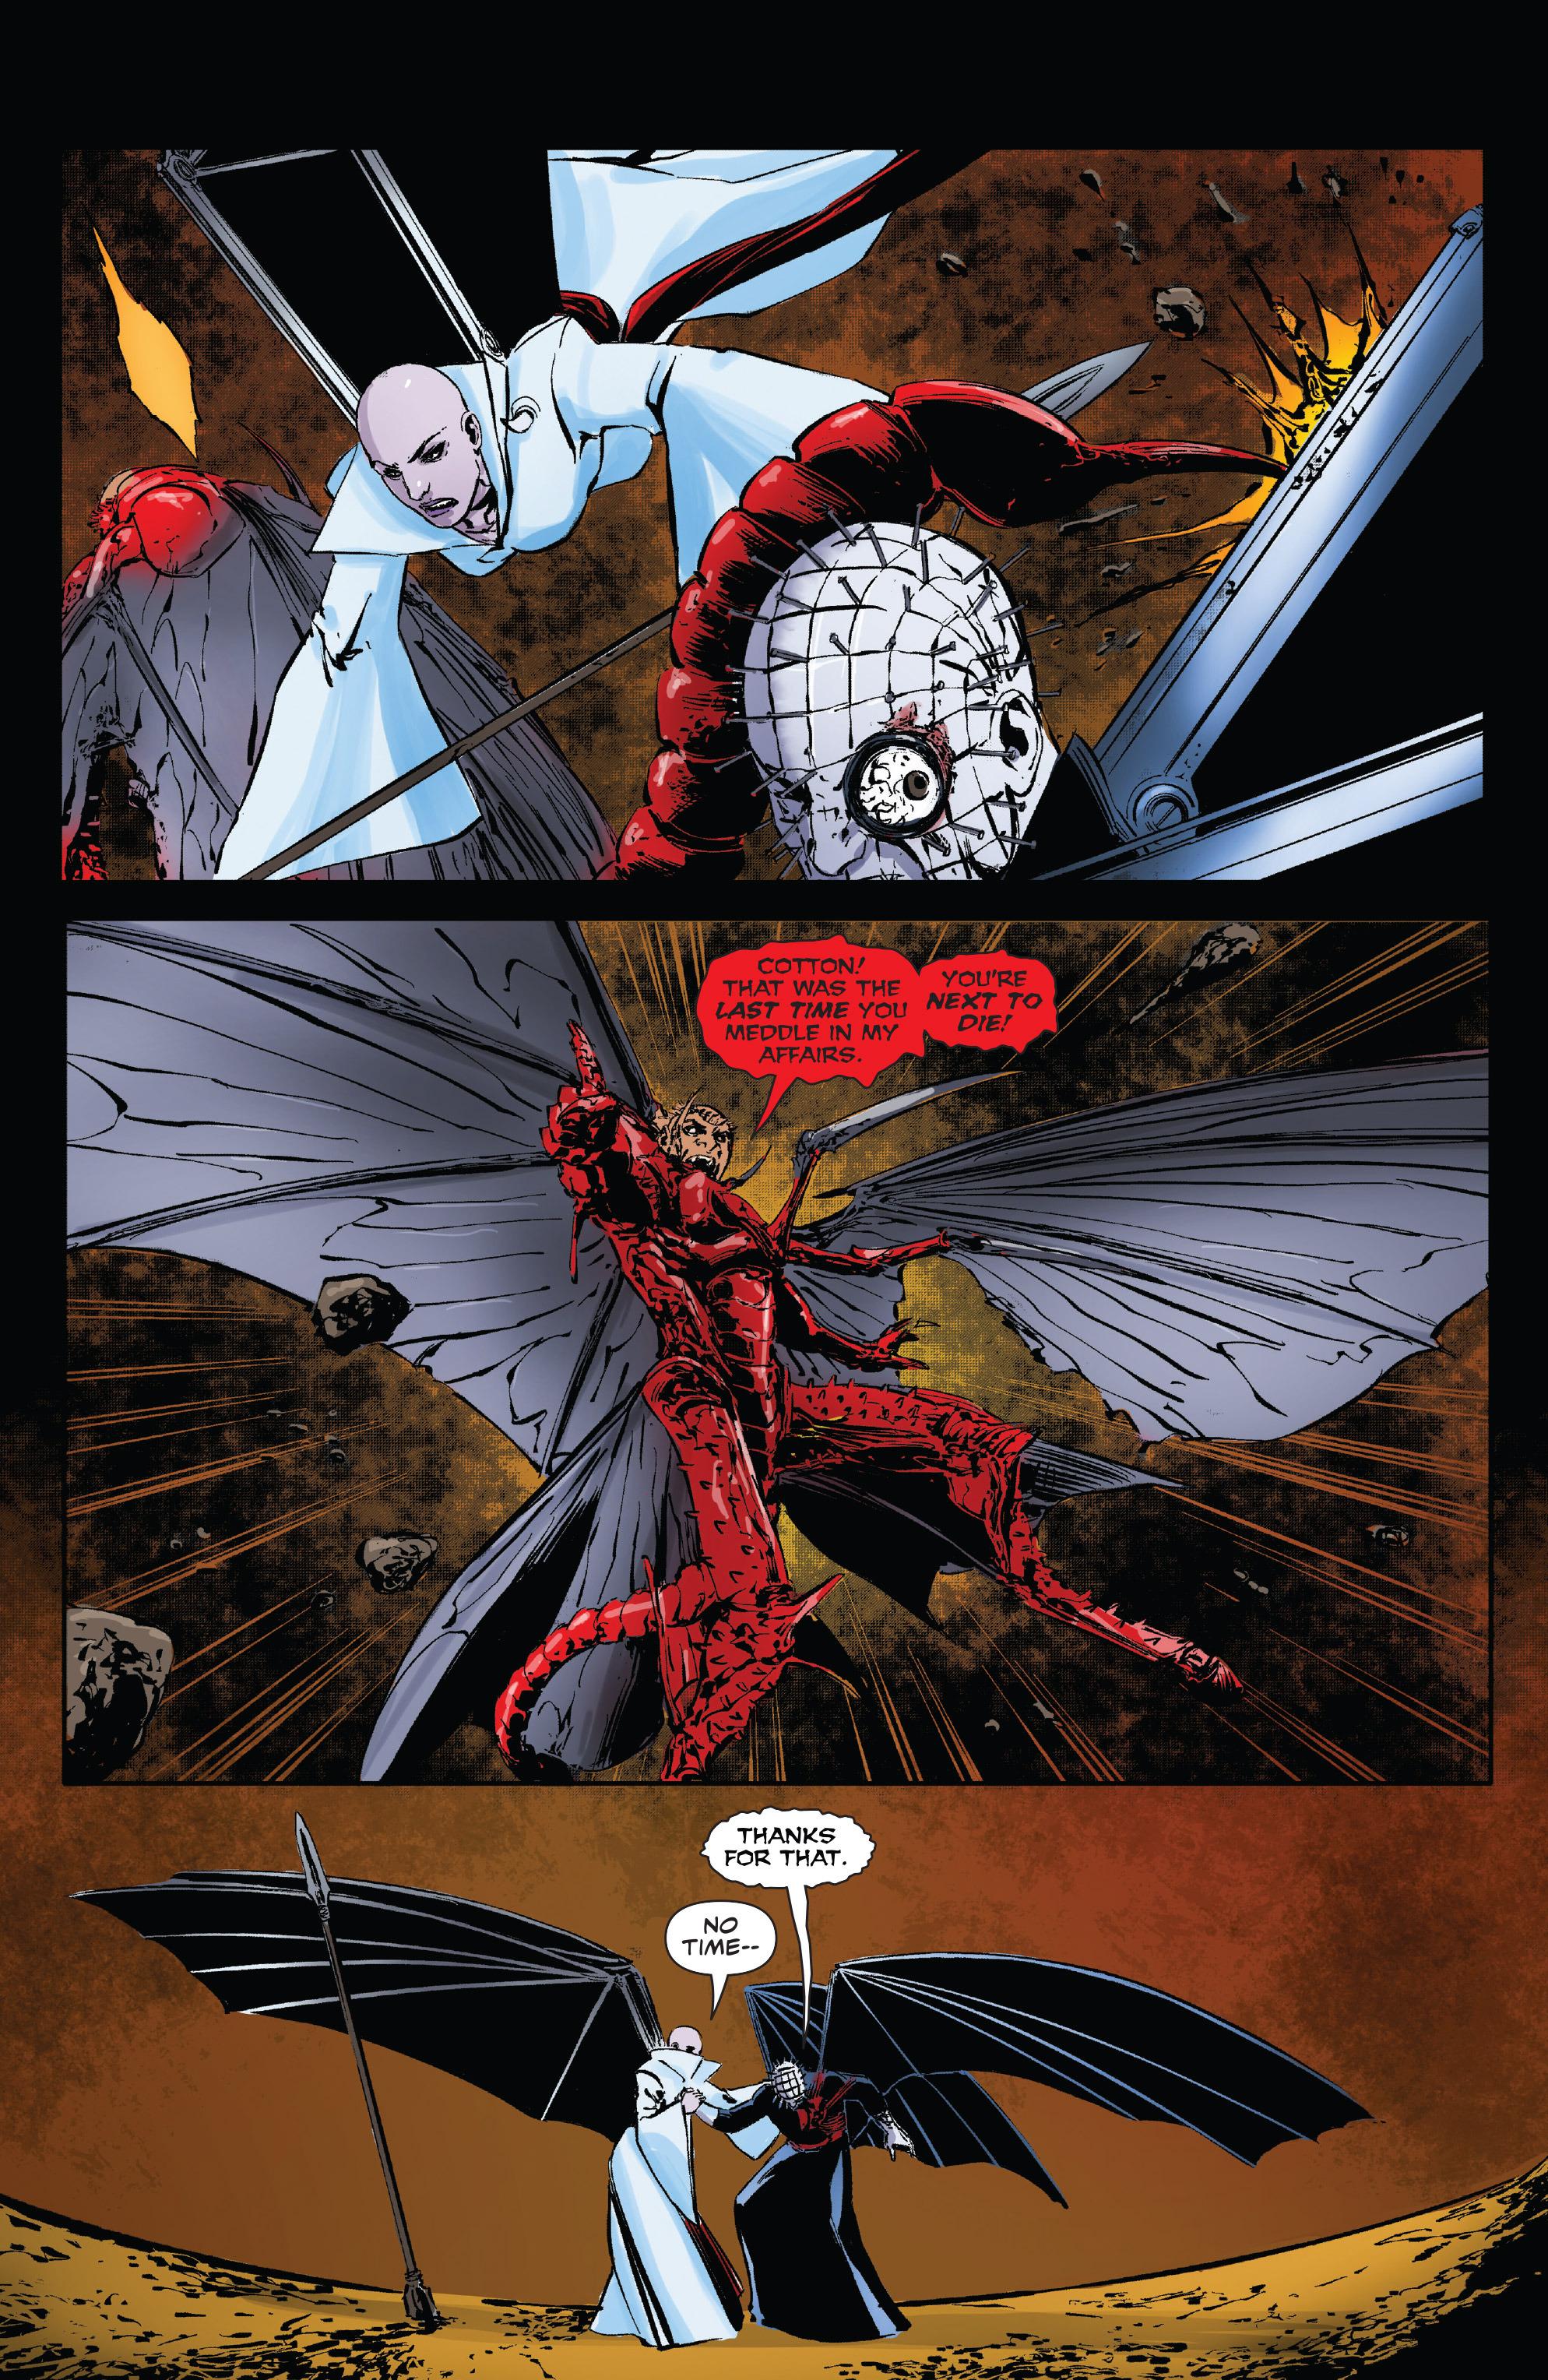 Read online Clive Barker's Hellraiser: The Dark Watch comic -  Issue # TPB 3 - 75